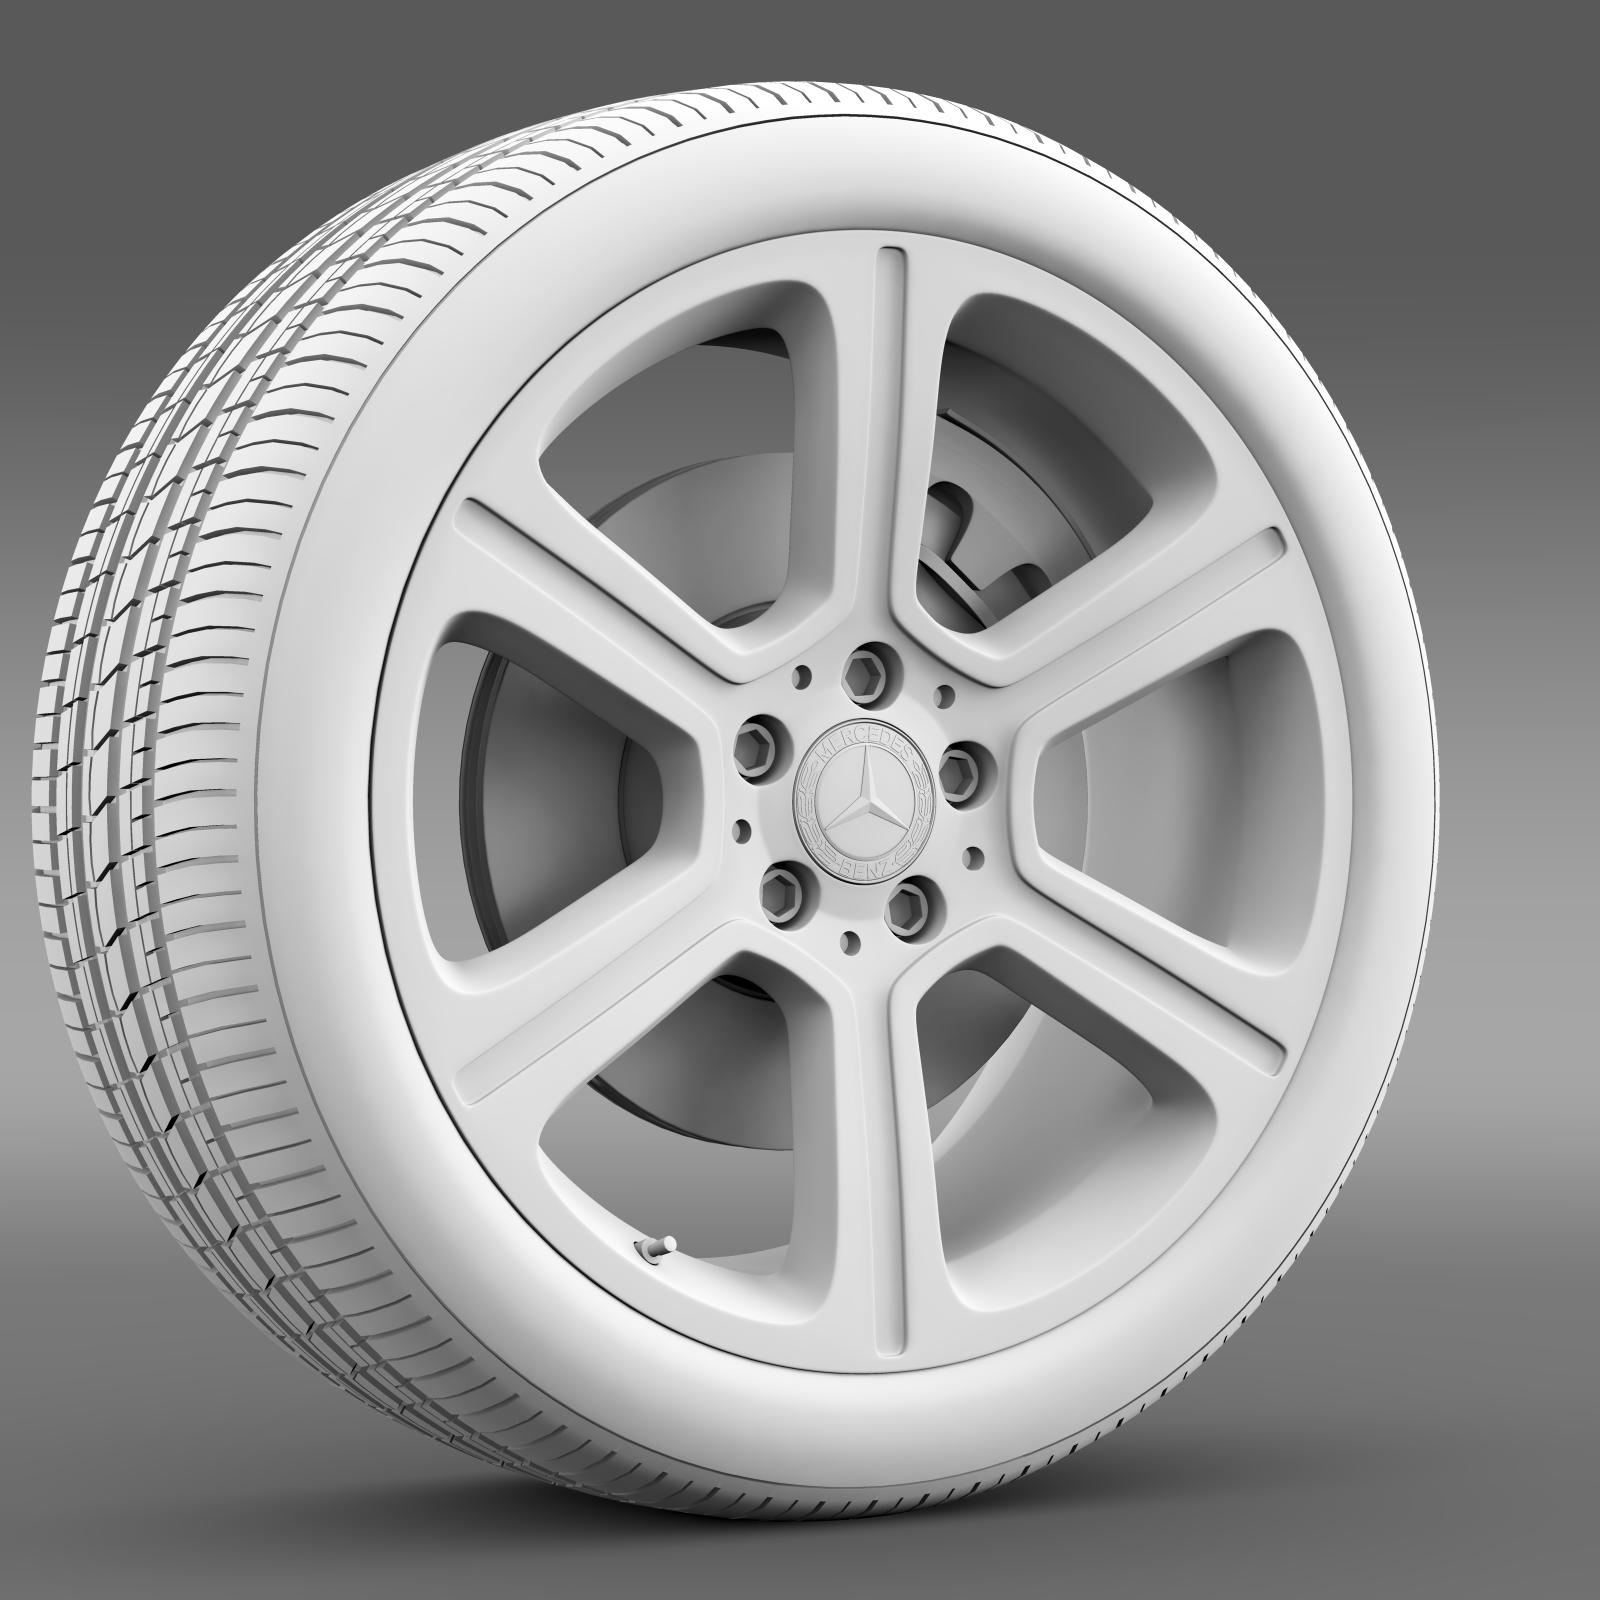 mercedes benz c 300 exclusive line wheel 3d model 3ds max fbx c4d lwo ma mb hrc xsi obj 210778